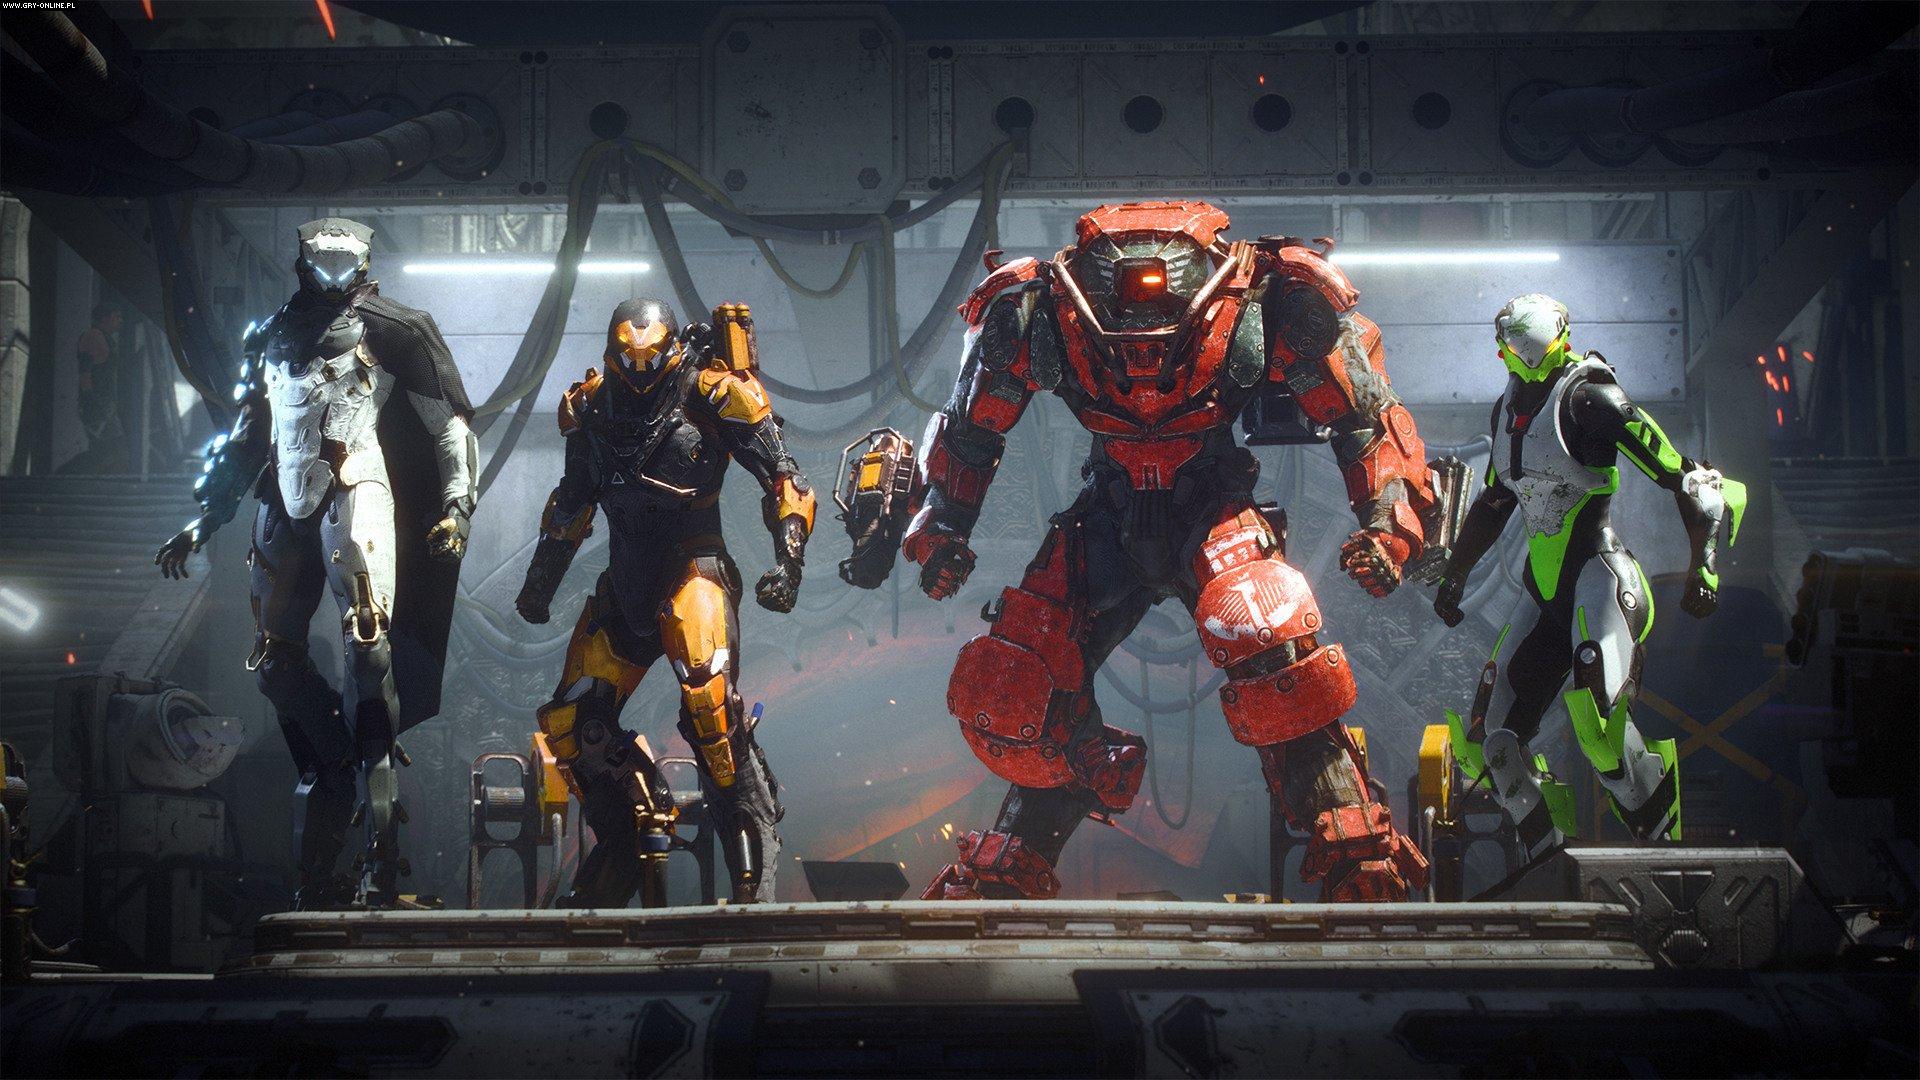 Anthem PC, PS4, XONE Games Image 2/52, BioWare Corporation, Electronic Arts Inc.